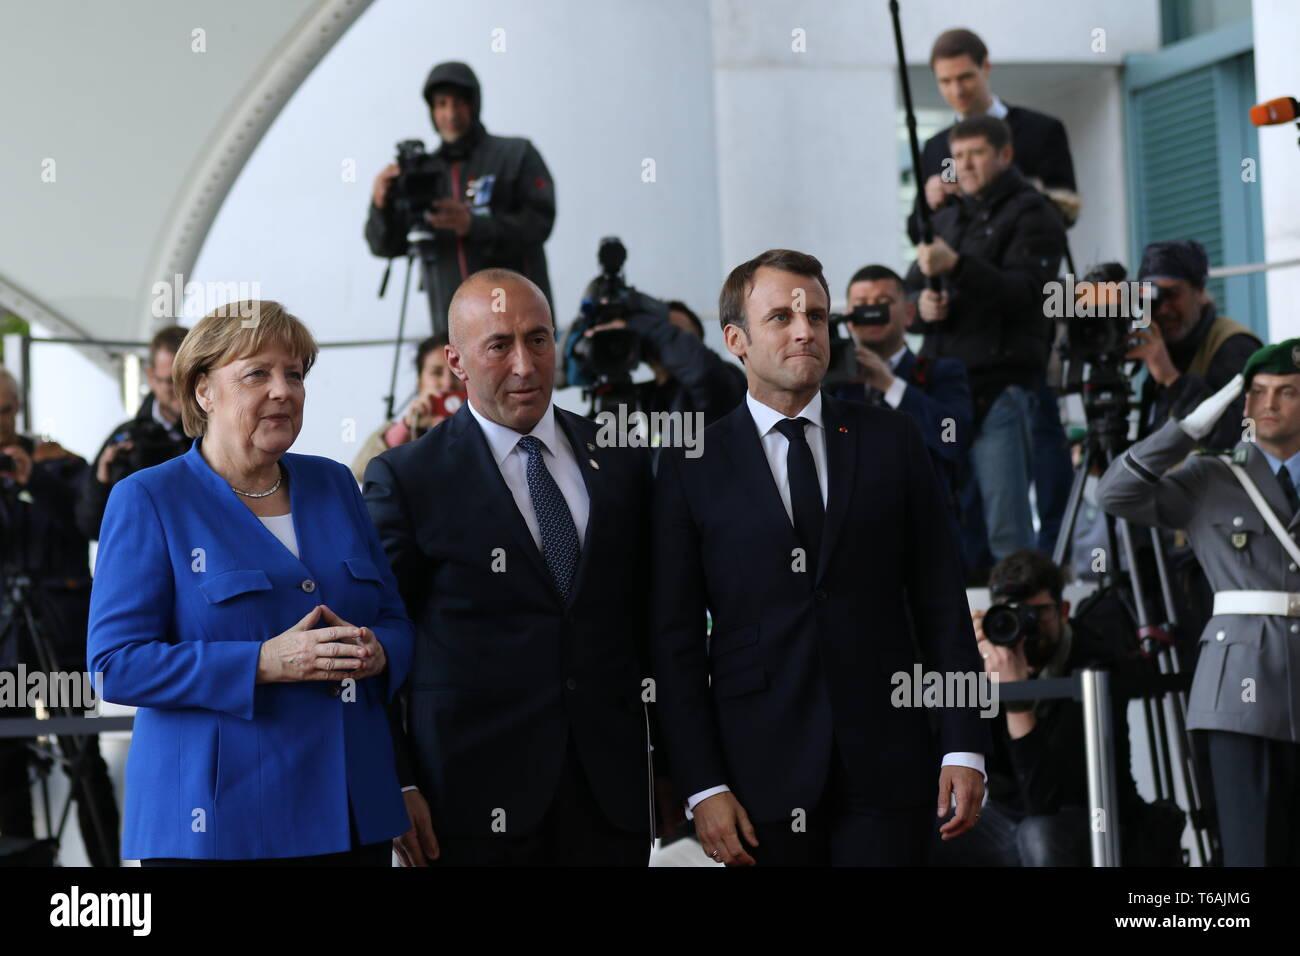 29.04.2019, Berlin, Germany, Chancellor Angela Merkel, President Emmanuel Macron and Prime Minister of Kosovo Ramush Haradinaj in the Chancellery. Cha - Stock Image